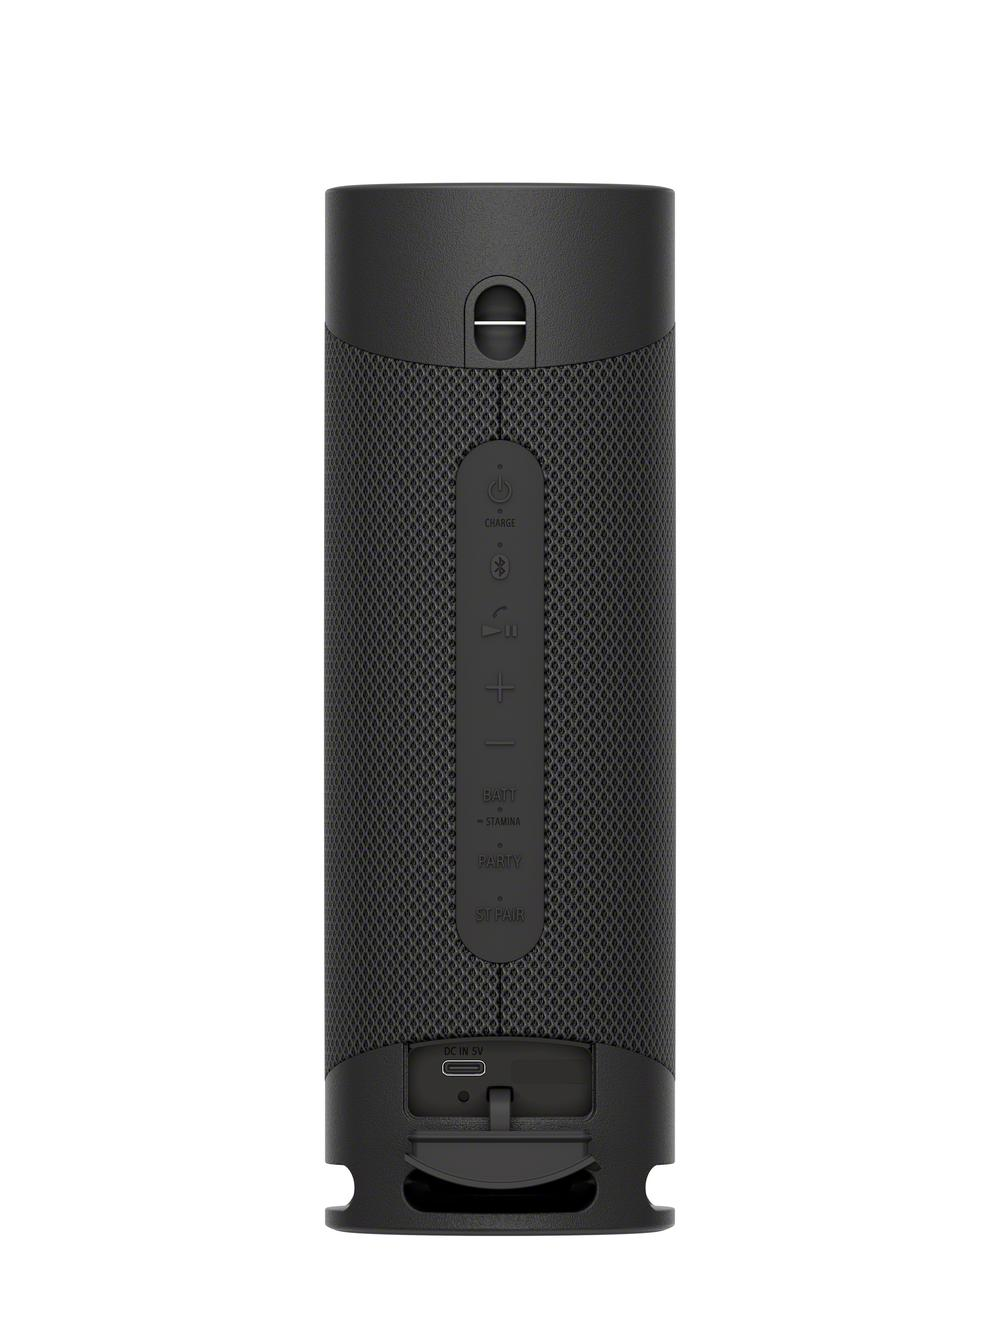 https://m2.mestores.com/pub/media/catalog/product/s/r/srs_xb23_black_rear-large.jpg